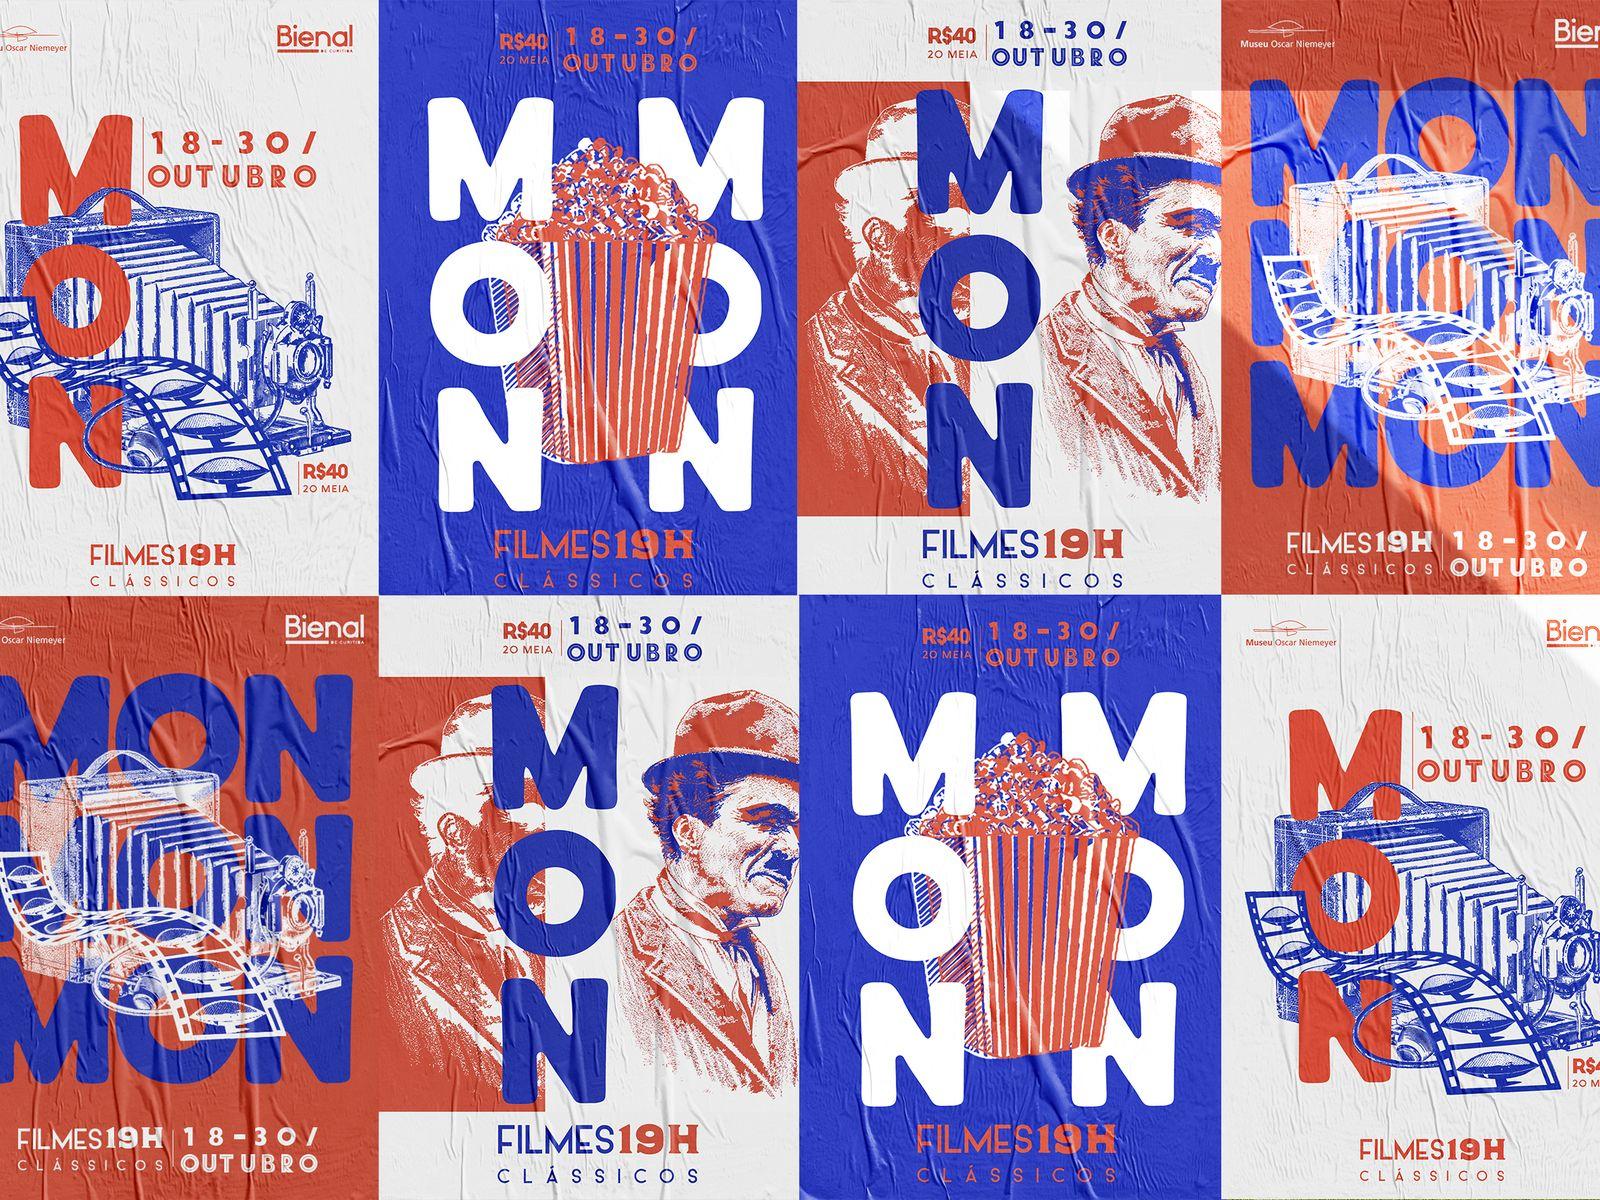 MON Classic Films Festival